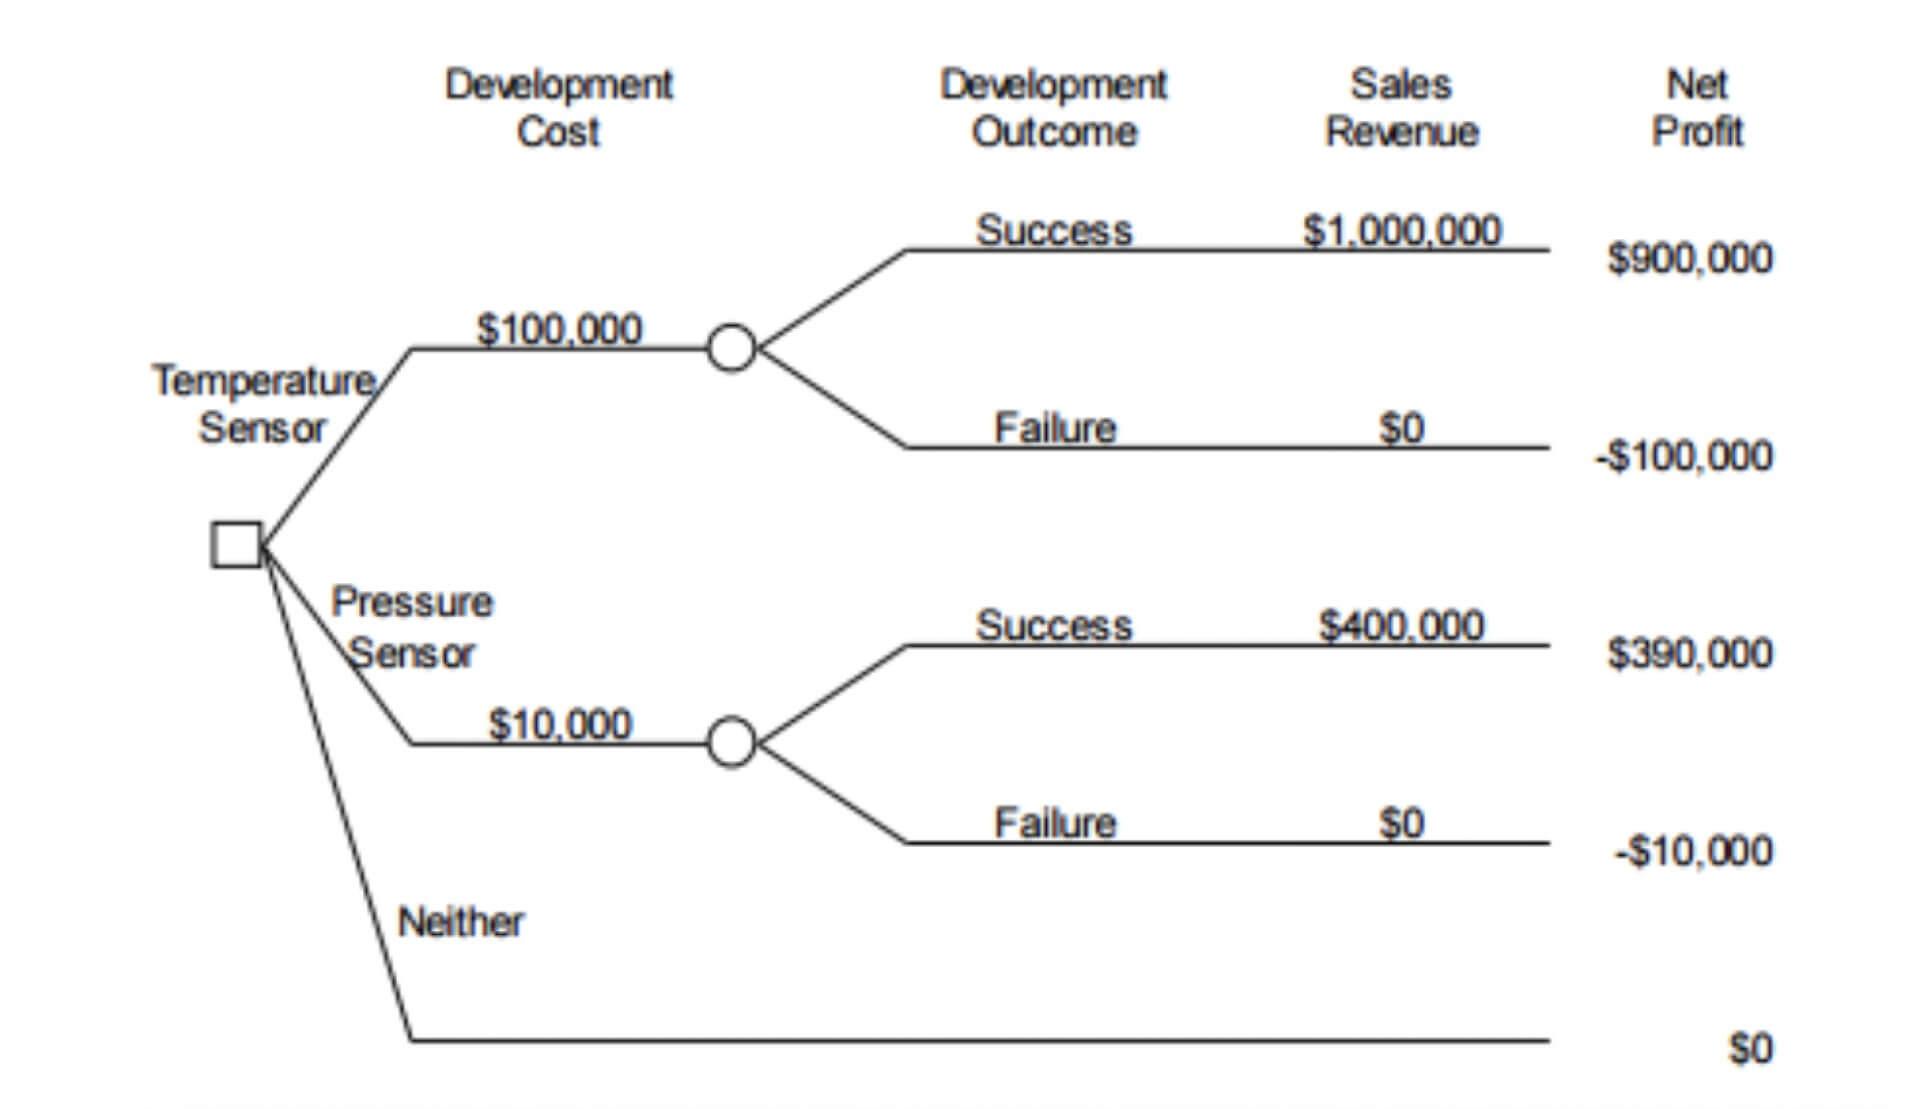 037 Template Ideas Free Decision Tree Powerpoint Prestigious Regarding Blank Decision Tree Template